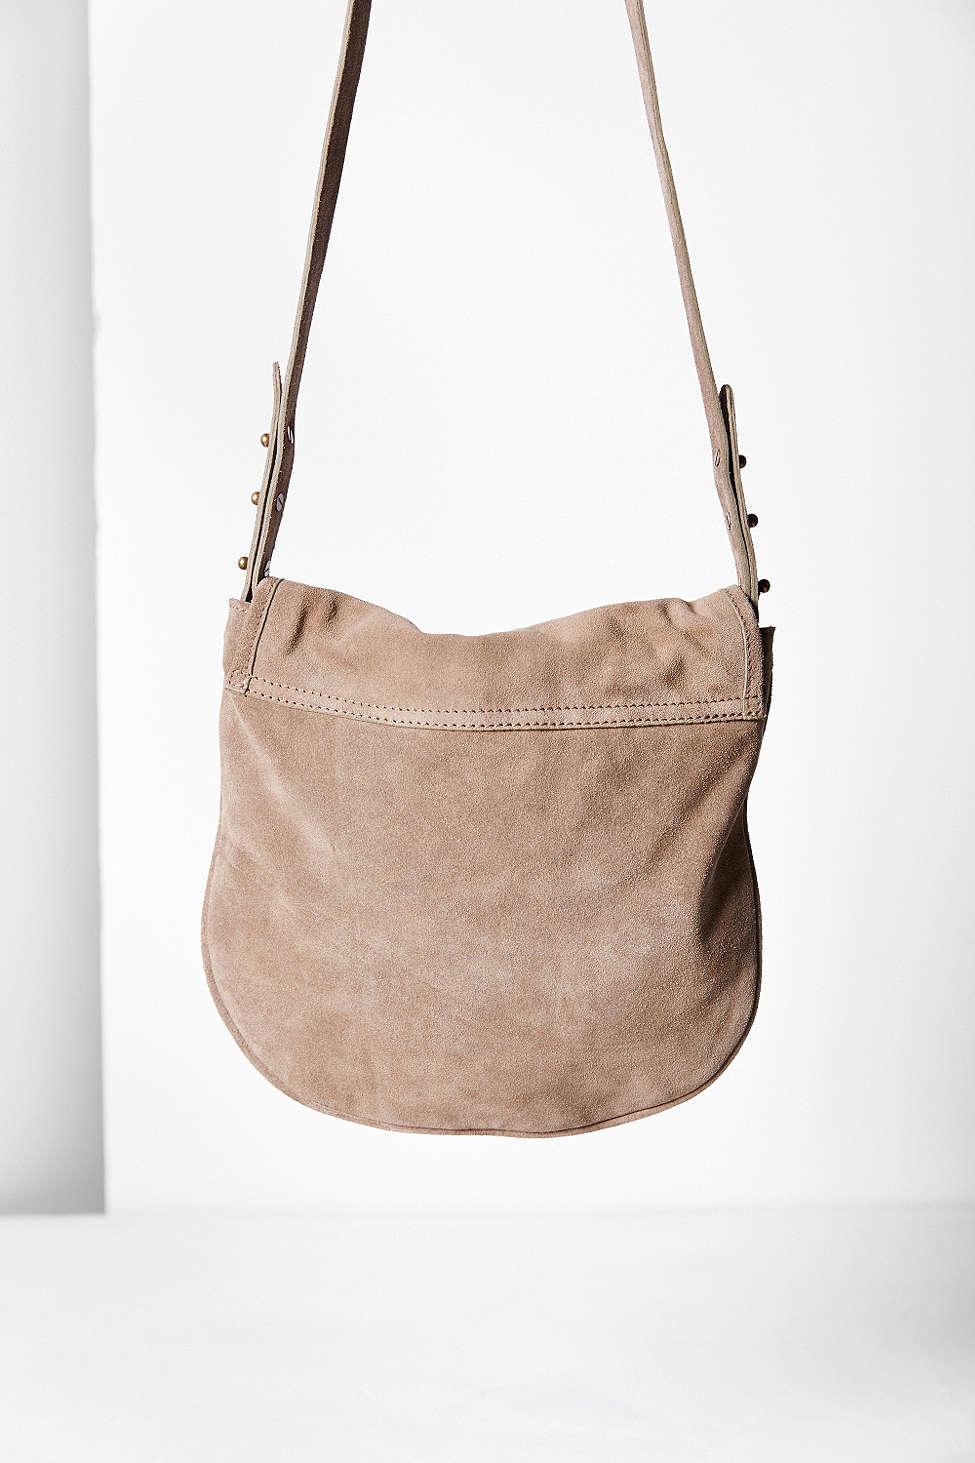 Lyst - BDG Minimalist Suede Crossbody Bag in Gray eea7b150e3d42